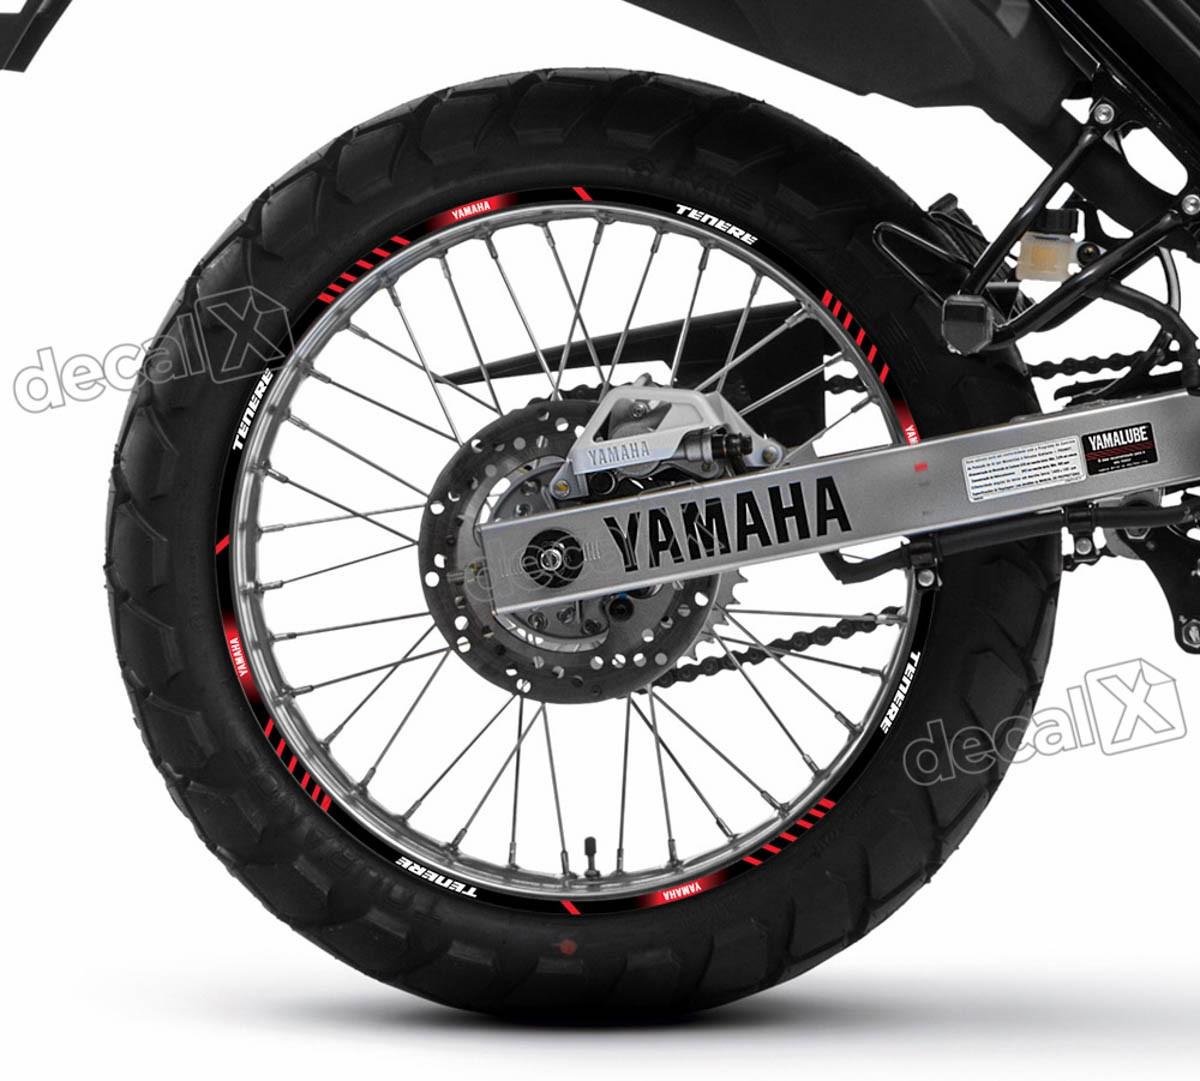 Kit Adesivo Friso Refletivo Roda Moto Yamaha Tenere 250 Fr55 Adesivos para motos& Adesivos